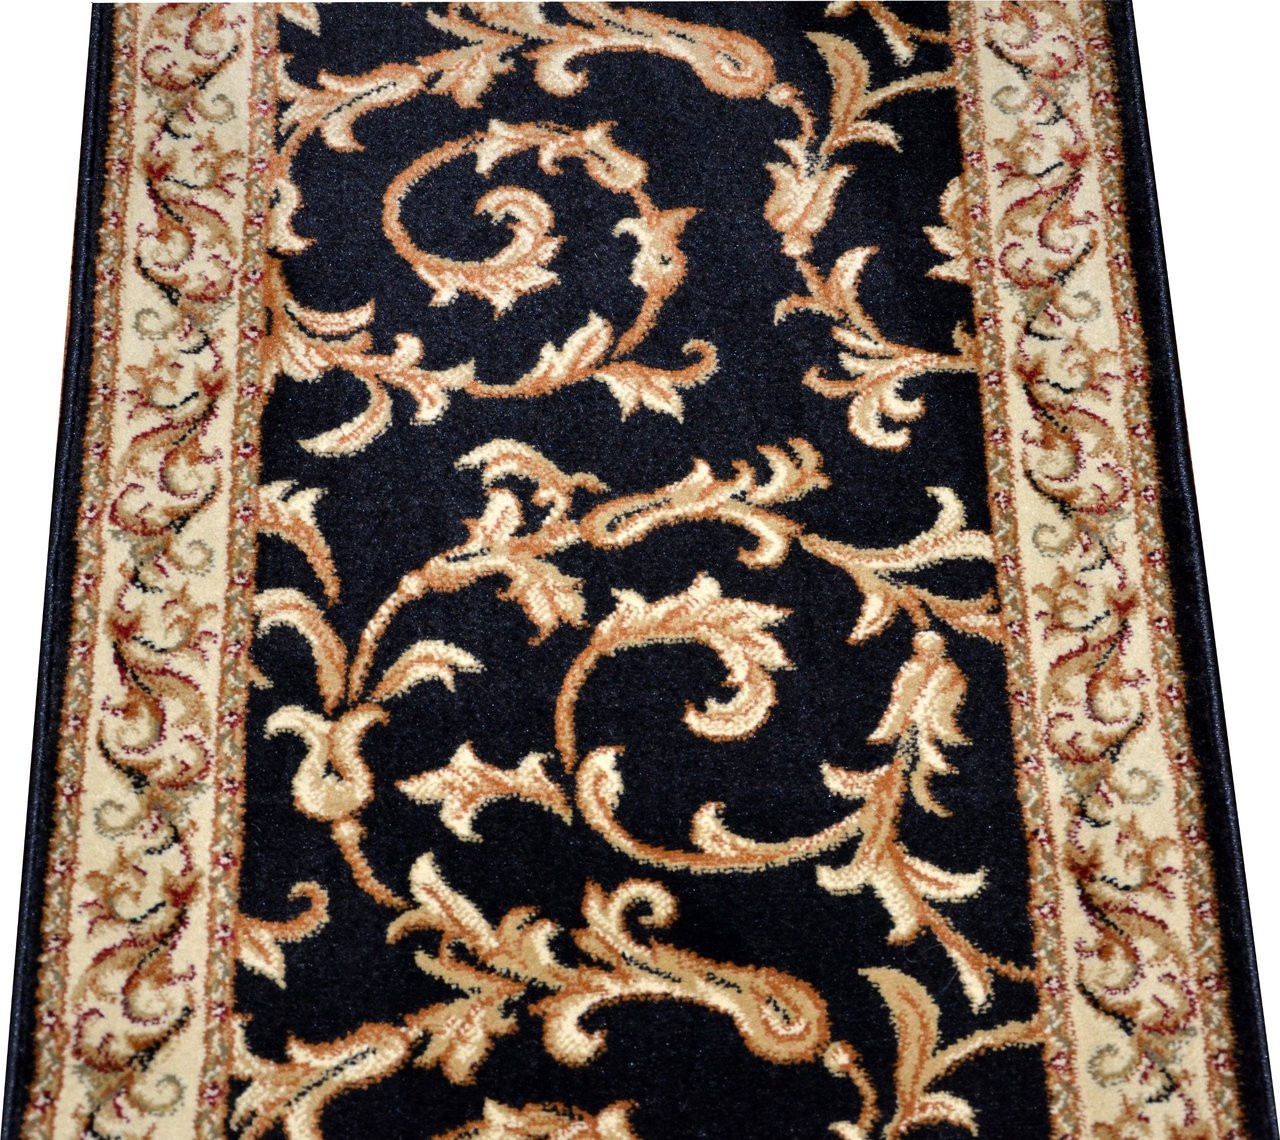 Dean Black Scrollworks Custom Length Carpet Rug Hallway | Hallway Carpet Runners By The Foot